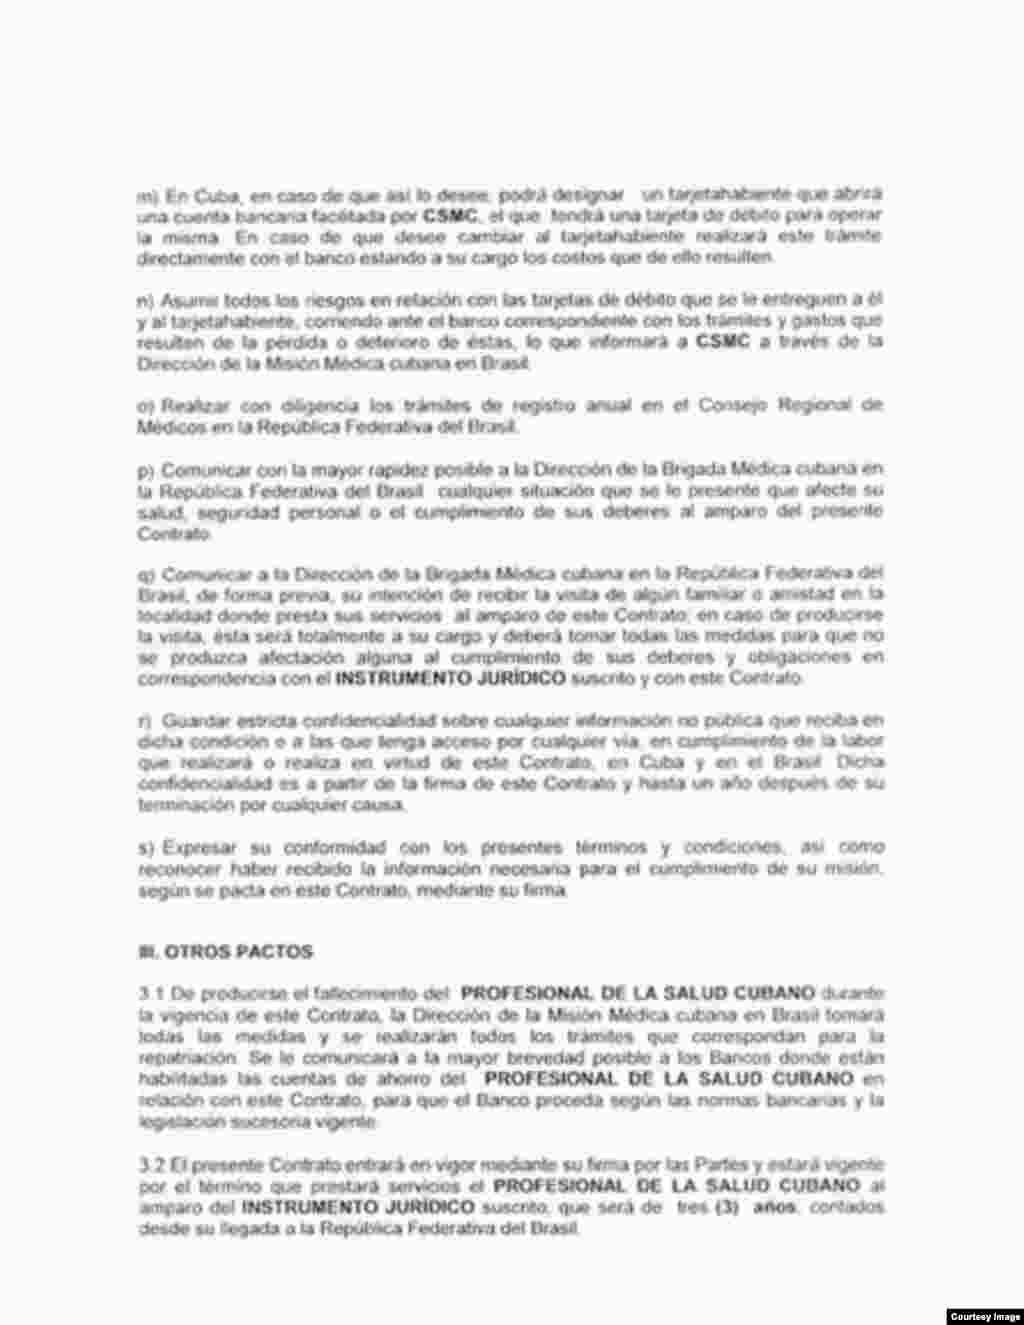 Copia de contrato de médica cubana en Brasil, cuarta página.